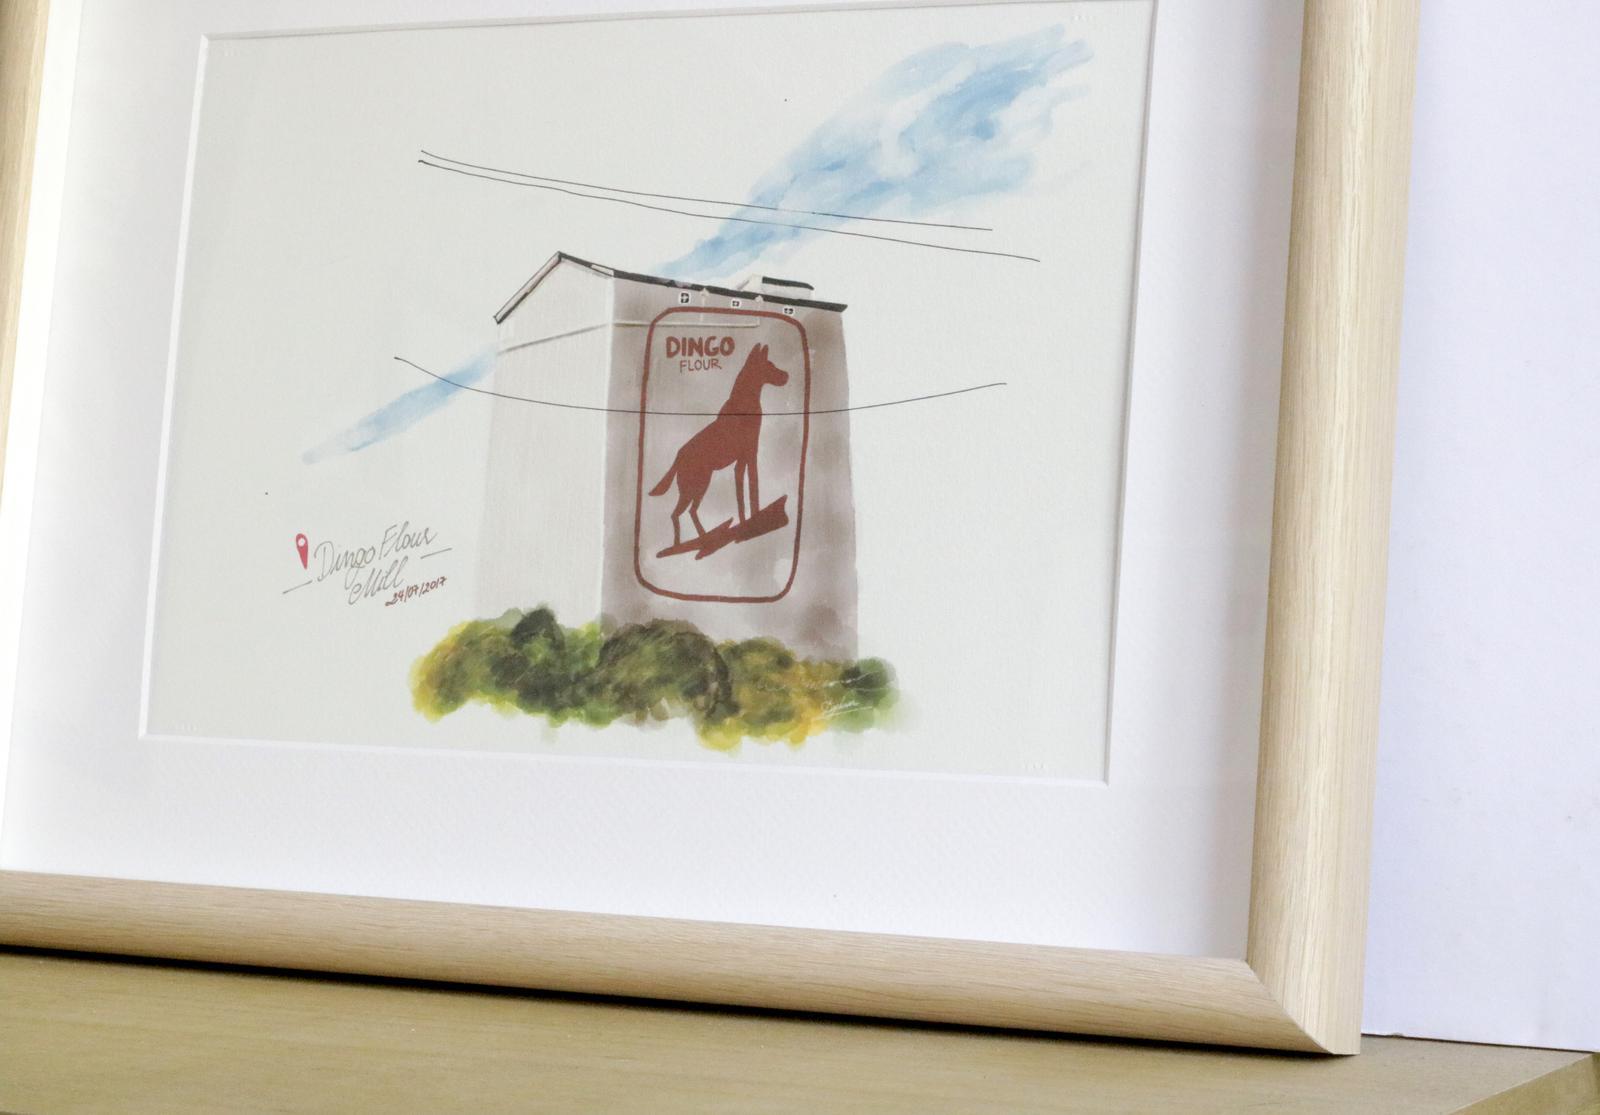 Product Images - Frames Work - Dingo Flour House